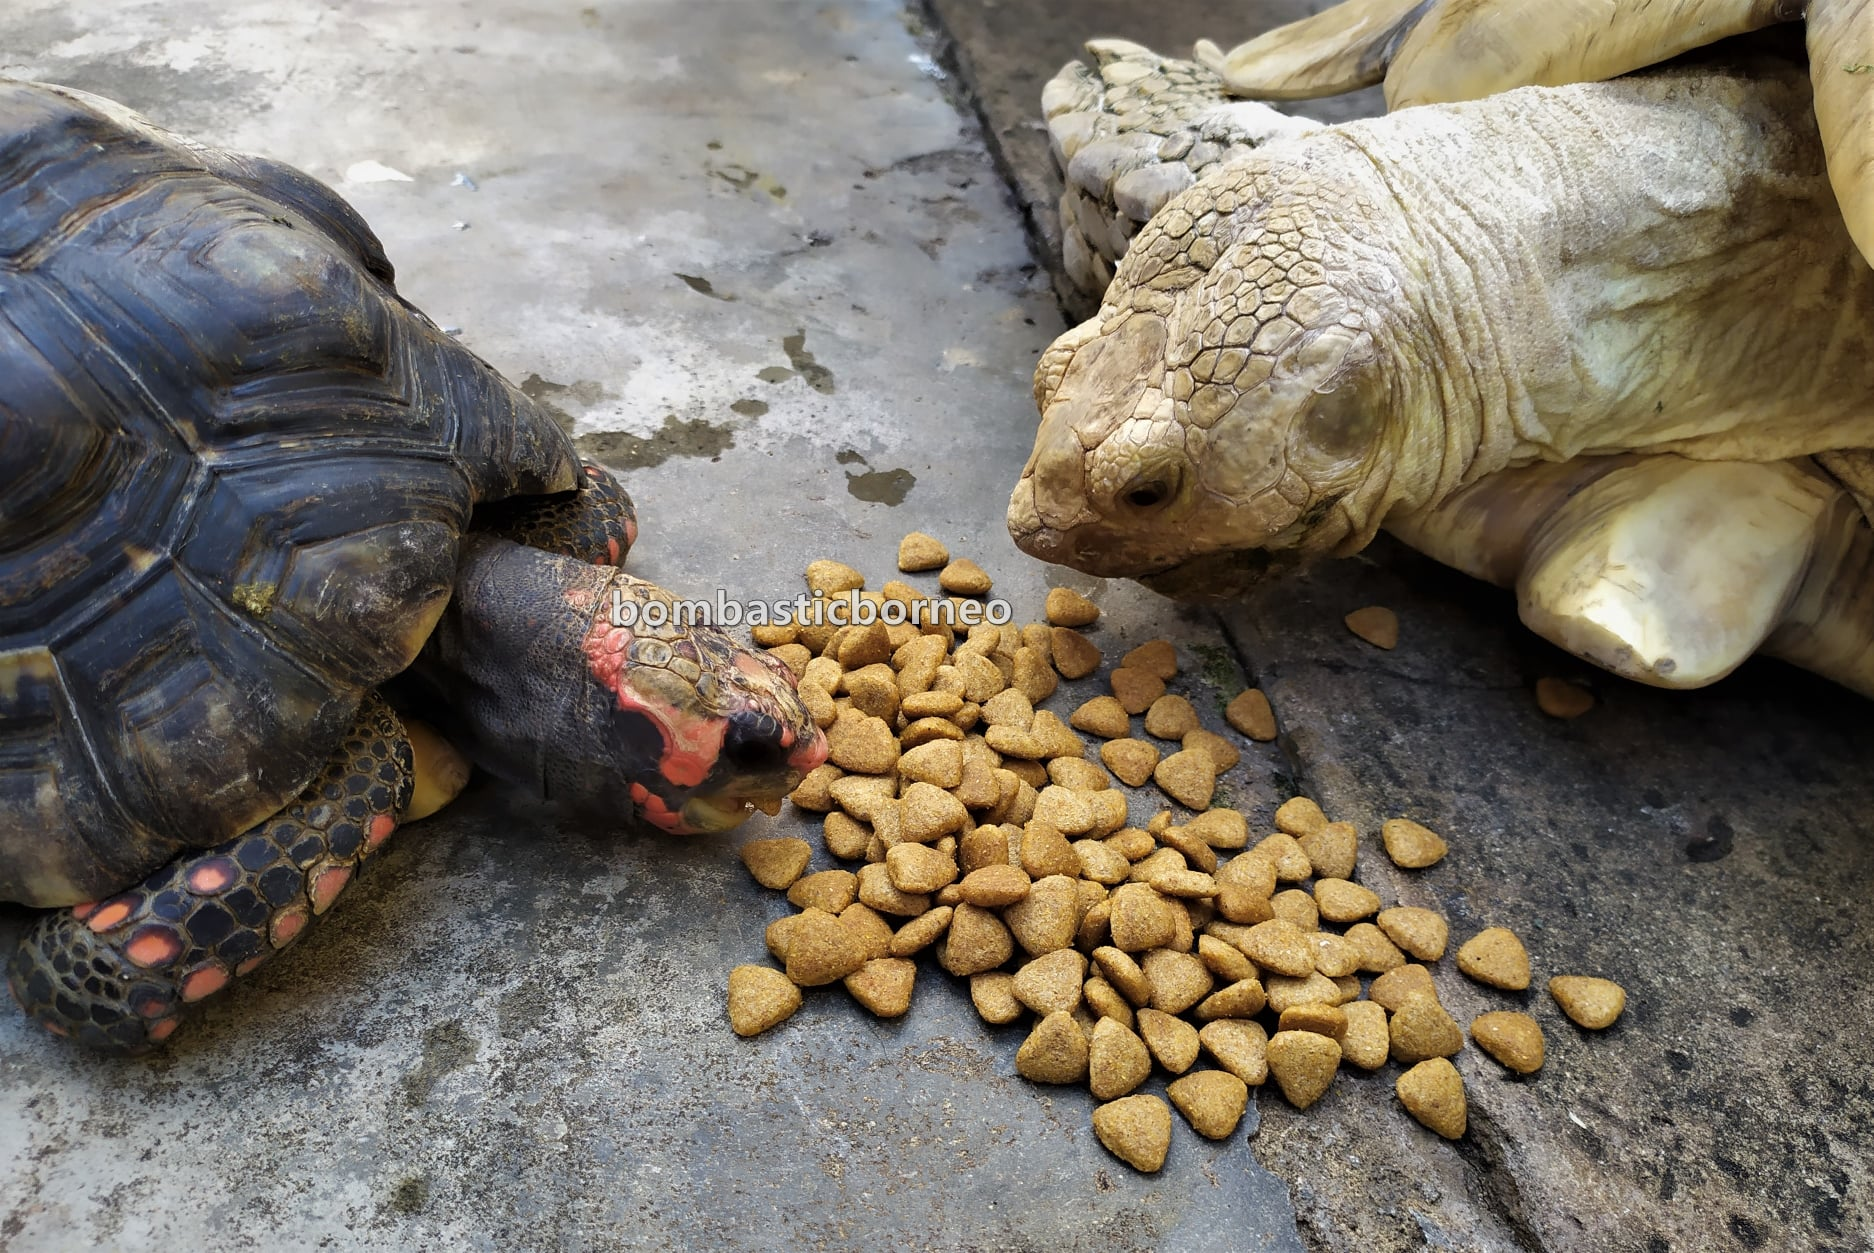 African spurred tortoise, Centrochelys sulcata, Sulcata tortoise, Kura-kura, Haiwan Peliharaan Eksotik, Exotic Animal, exotic pets, hobby, exploration, Kho Animal Enterprise, Kuching, Sarawak, Malaysia, Tourism, travel guide,